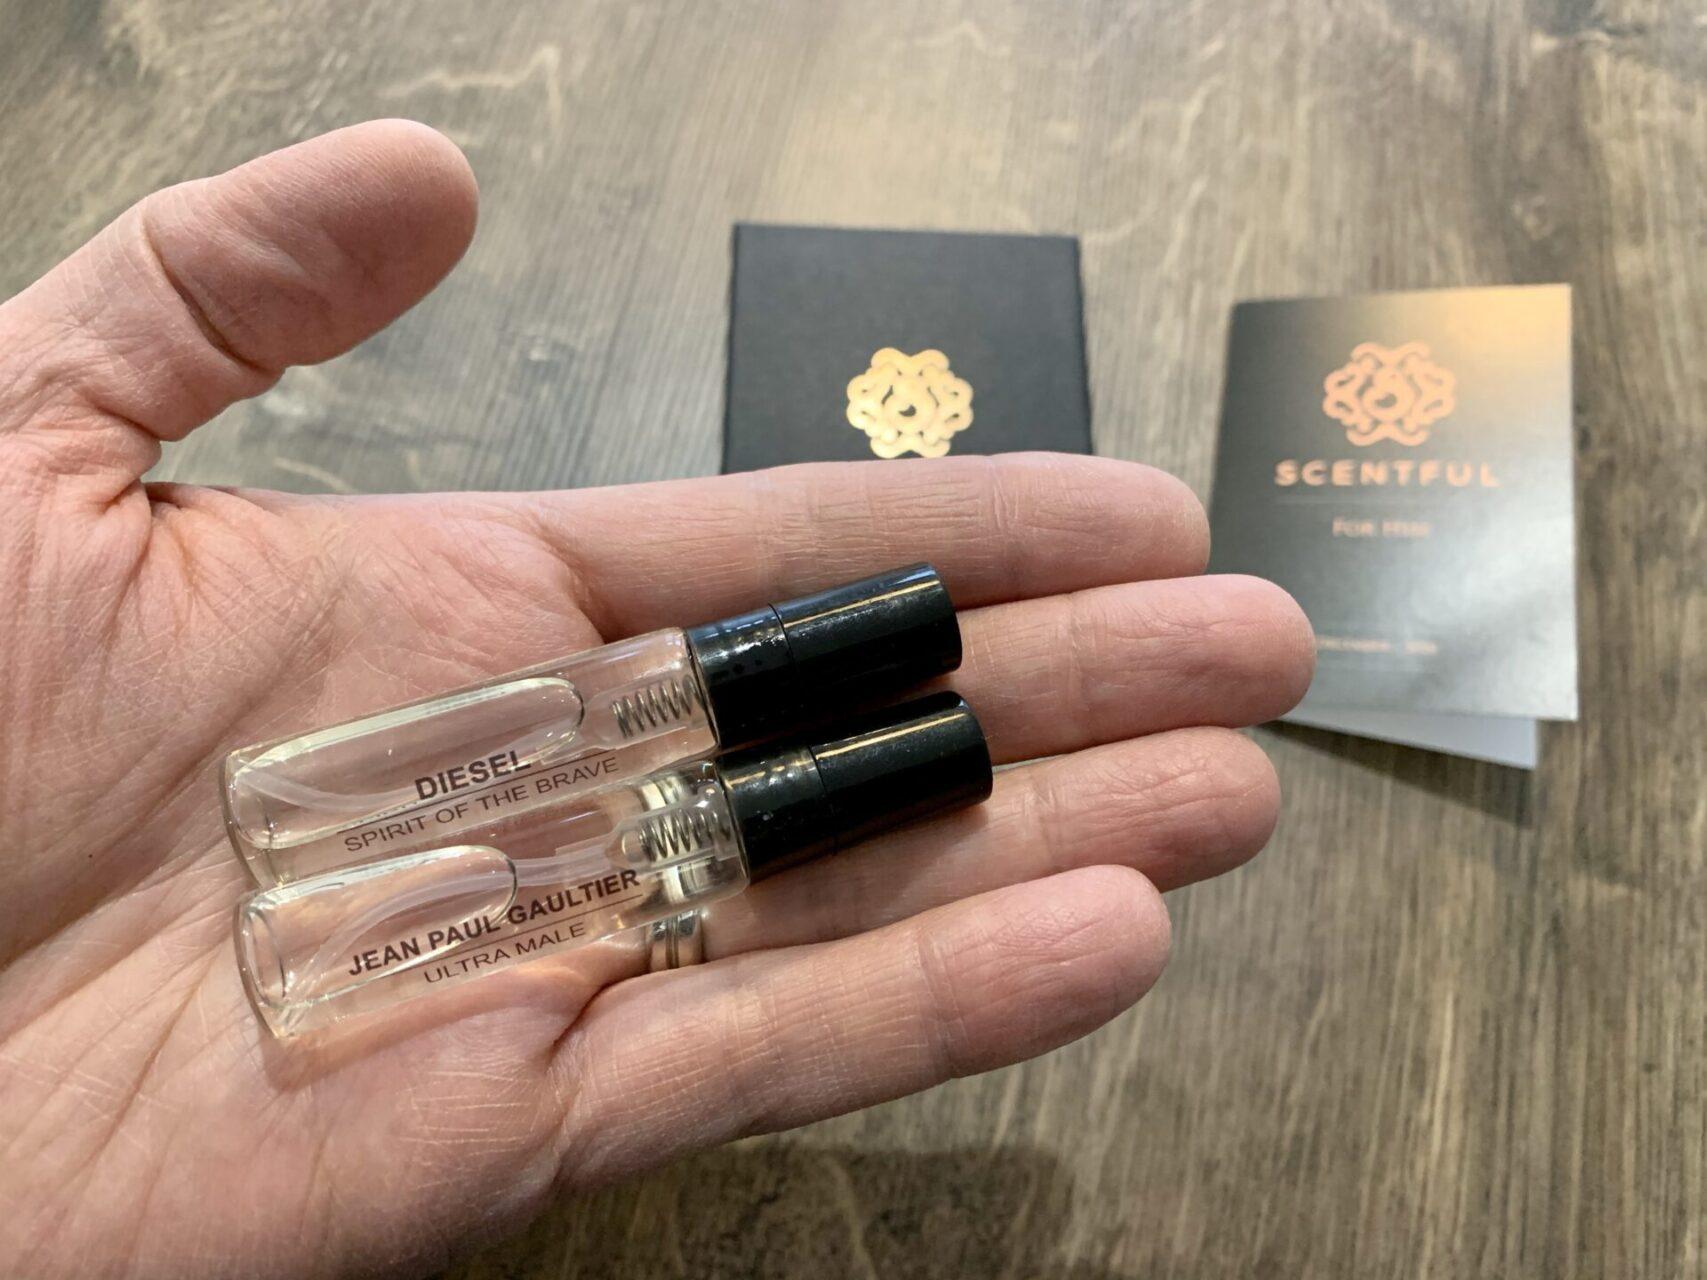 Scentful 2x aftershave sprays